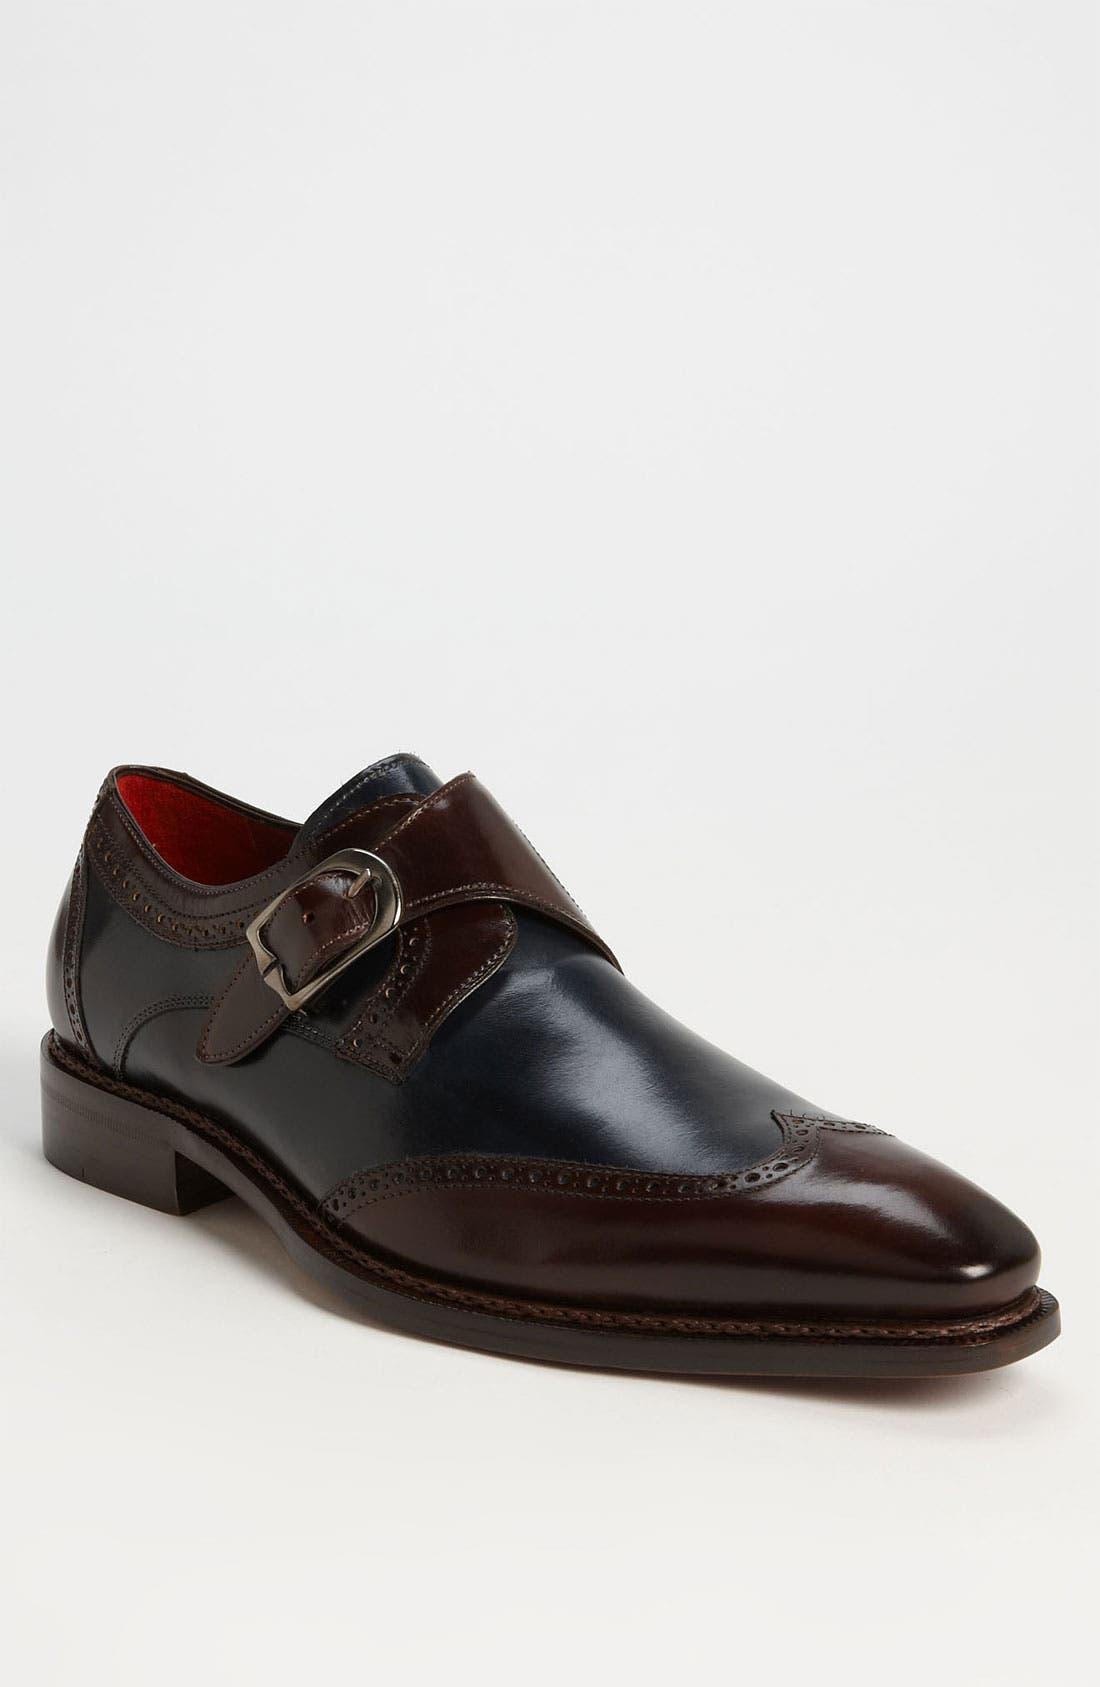 Main Image - Mezlan 'Cleto' Monk Strap Spectator Shoe